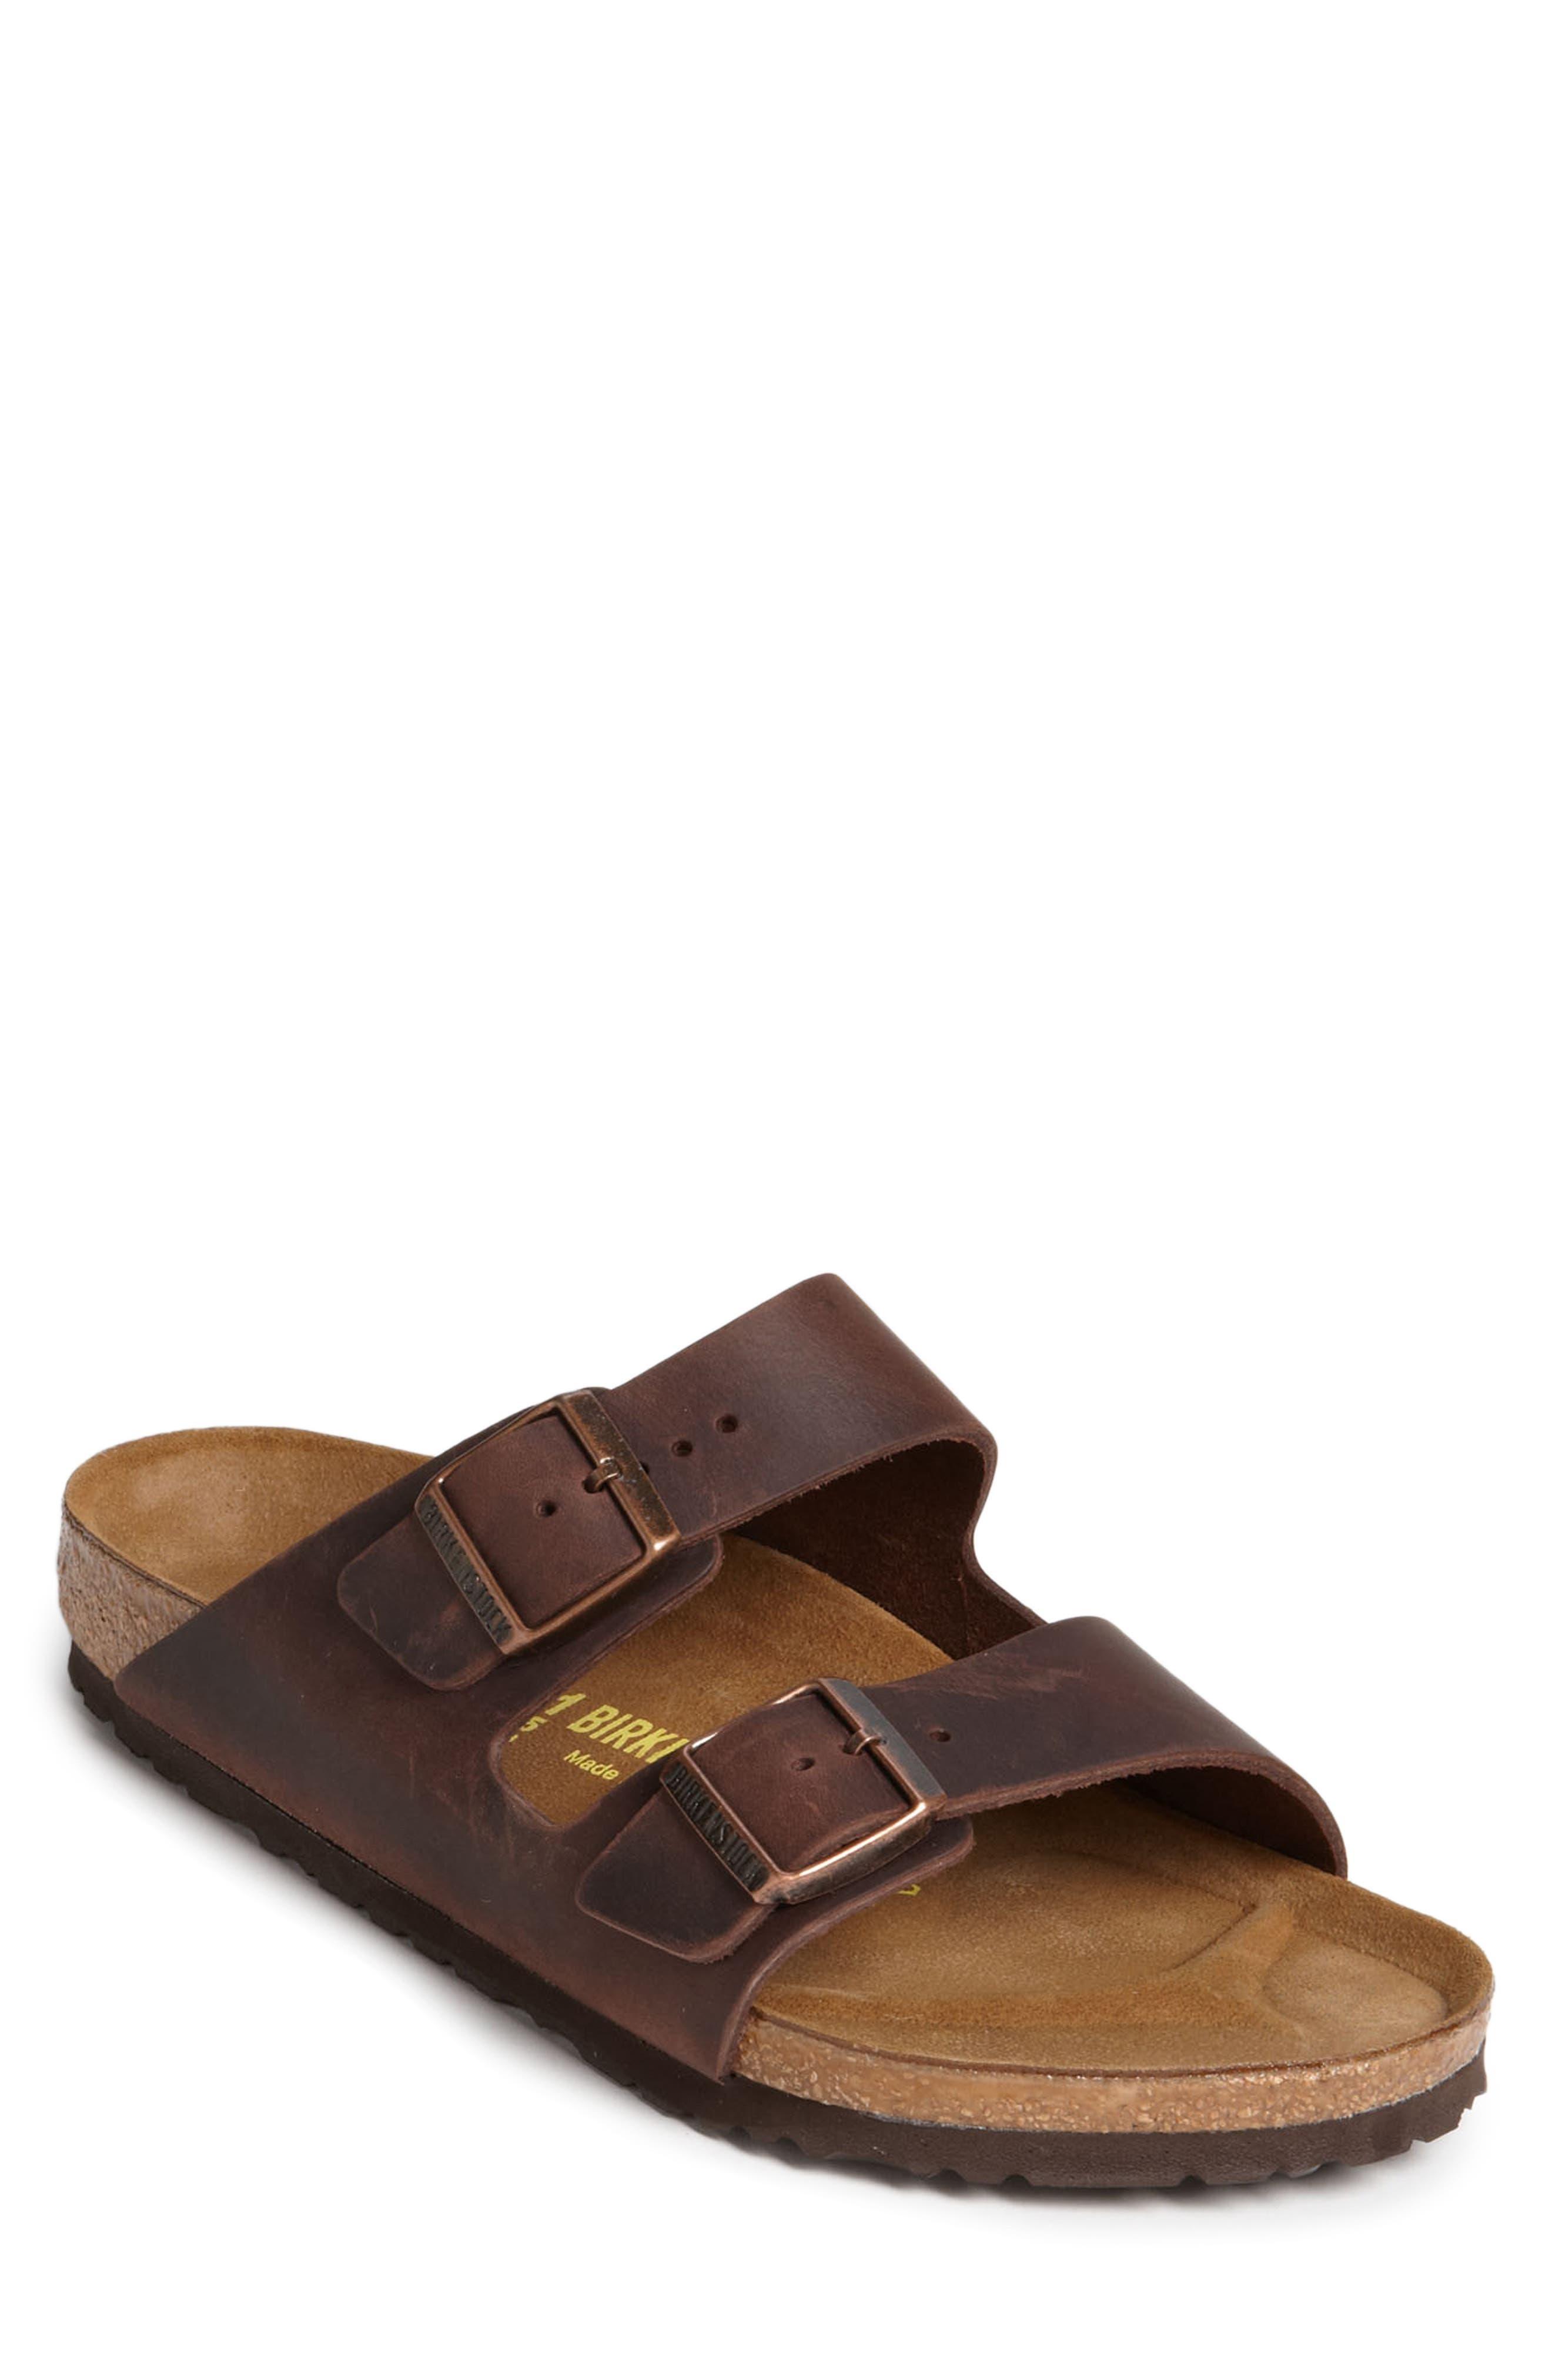 Arizona Slide Sandal,                             Main thumbnail 1, color,                             HABANA OILED BROWN